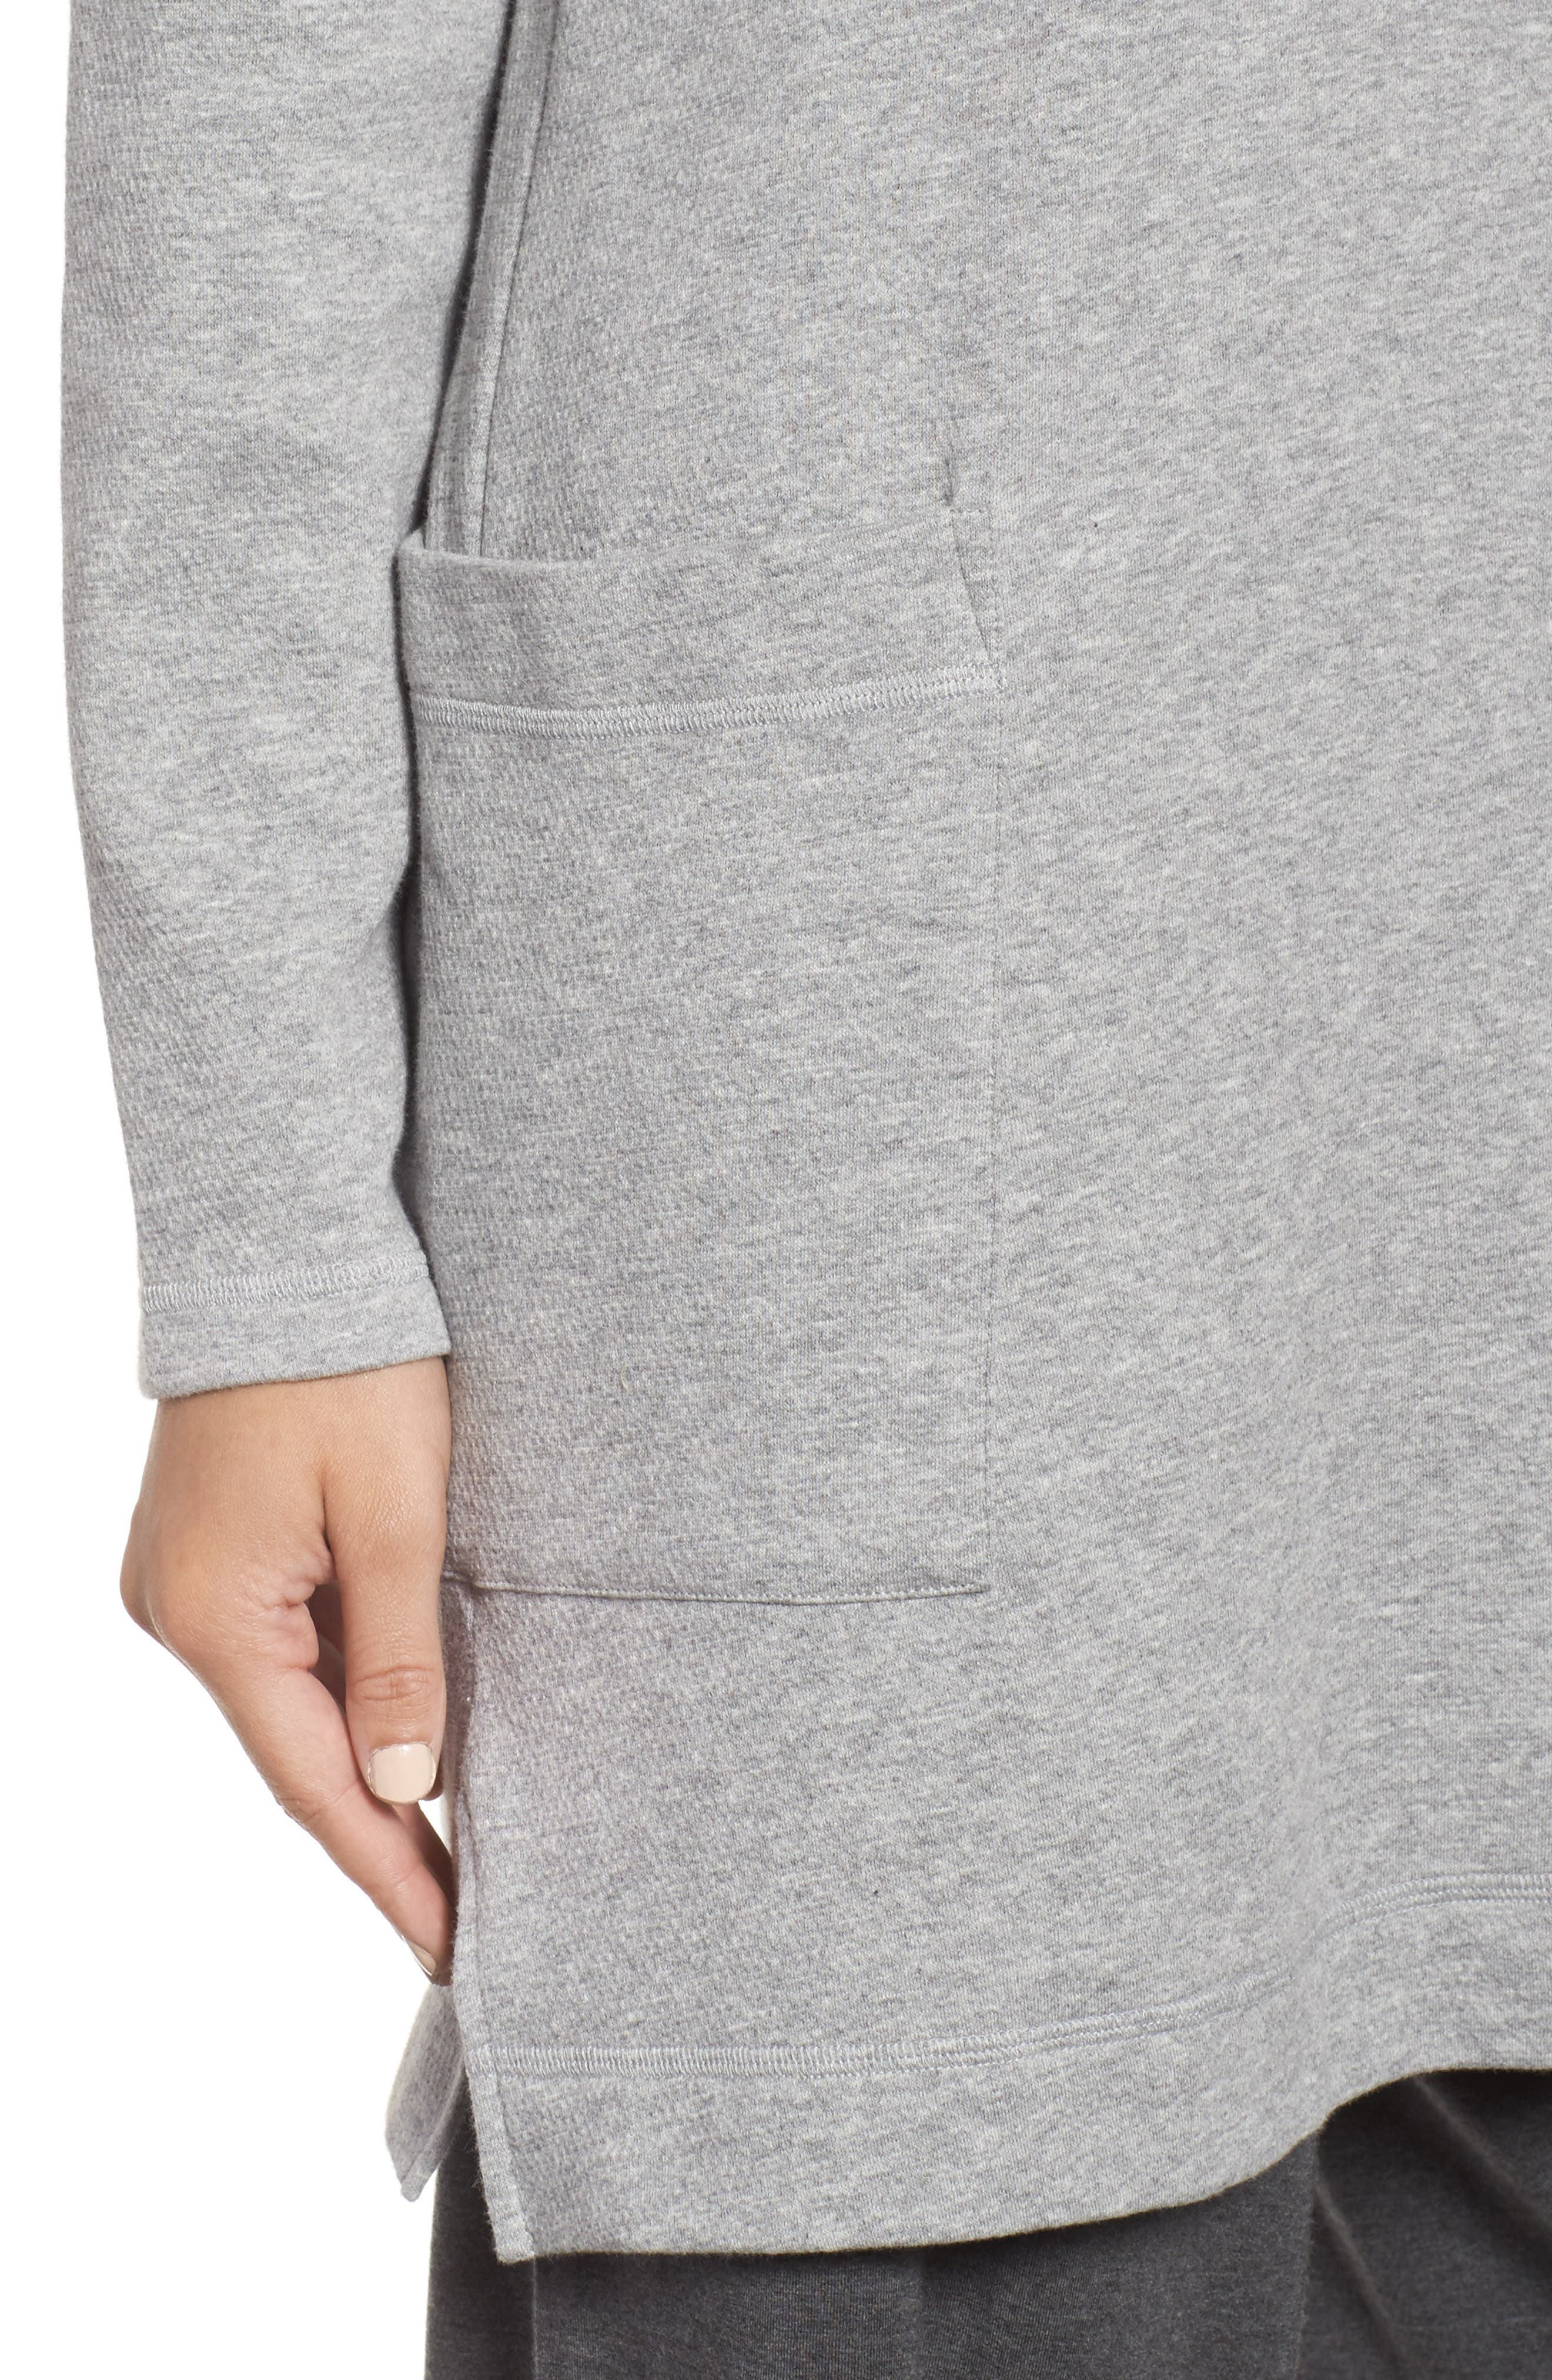 Double Knit Organic Cotton Tunic,                             Alternate thumbnail 4, color,                             022